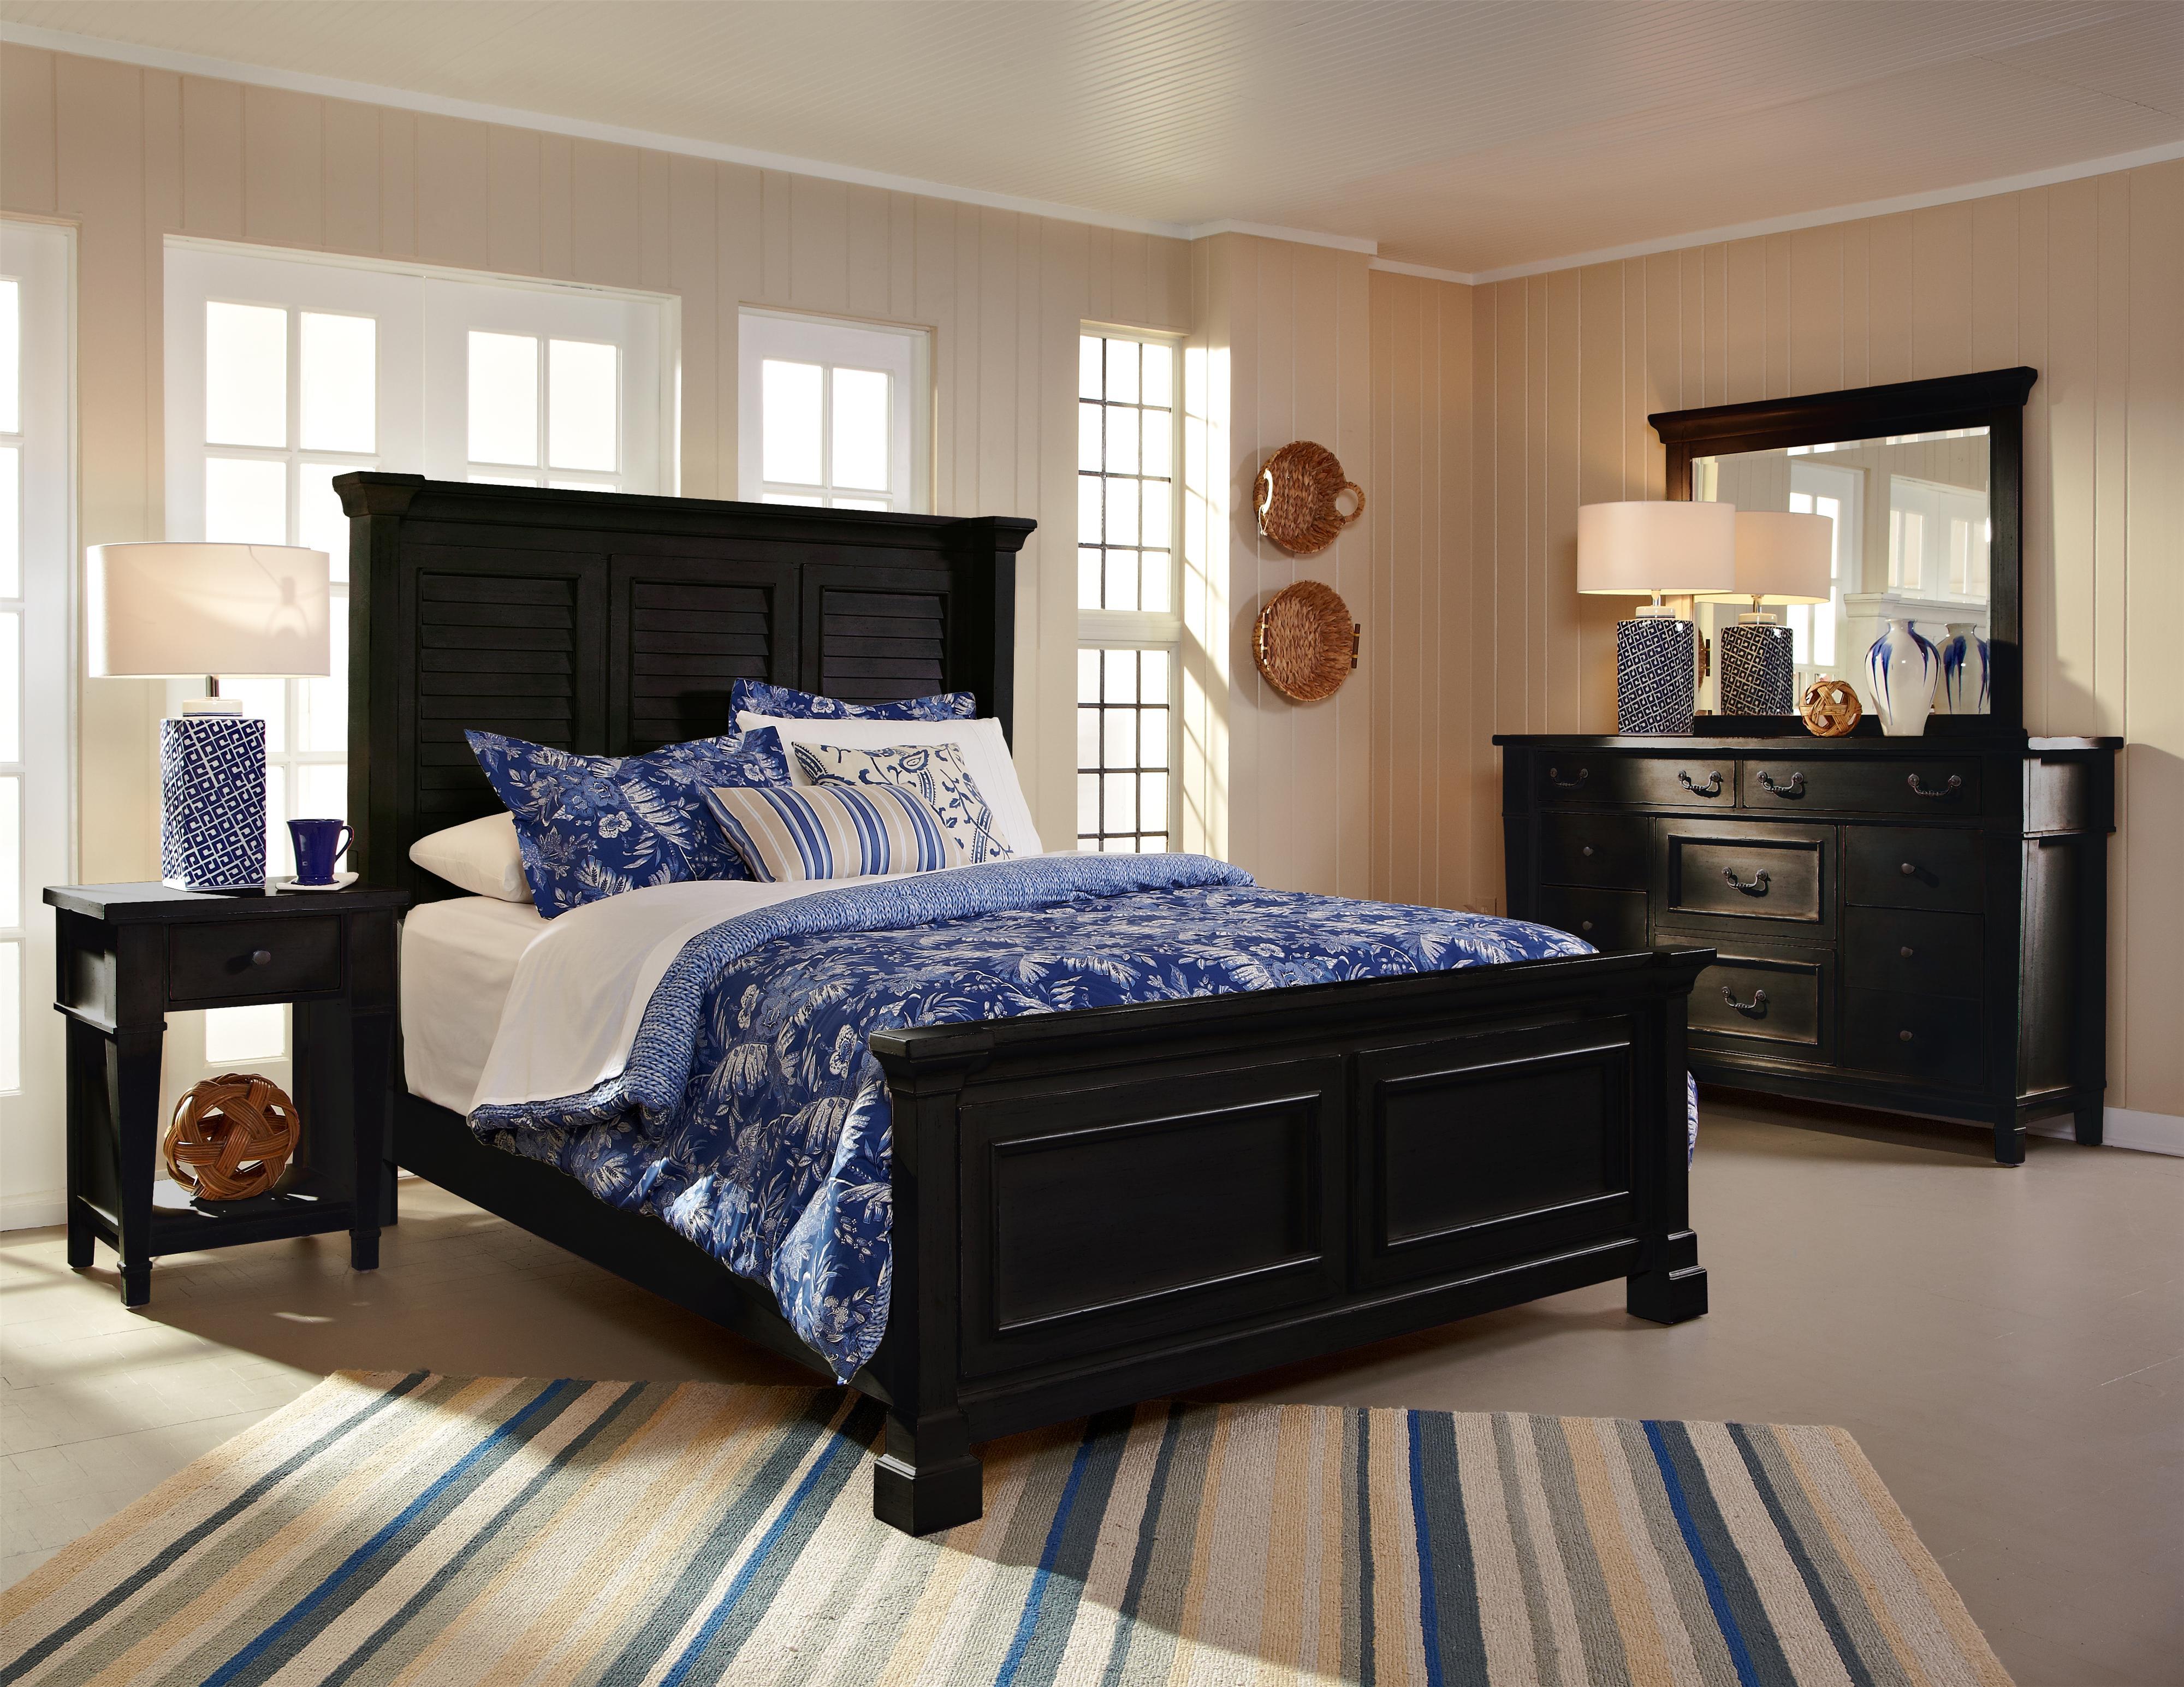 Stoney creek bedroom set interior design ideas for Stoney creek bedroom set